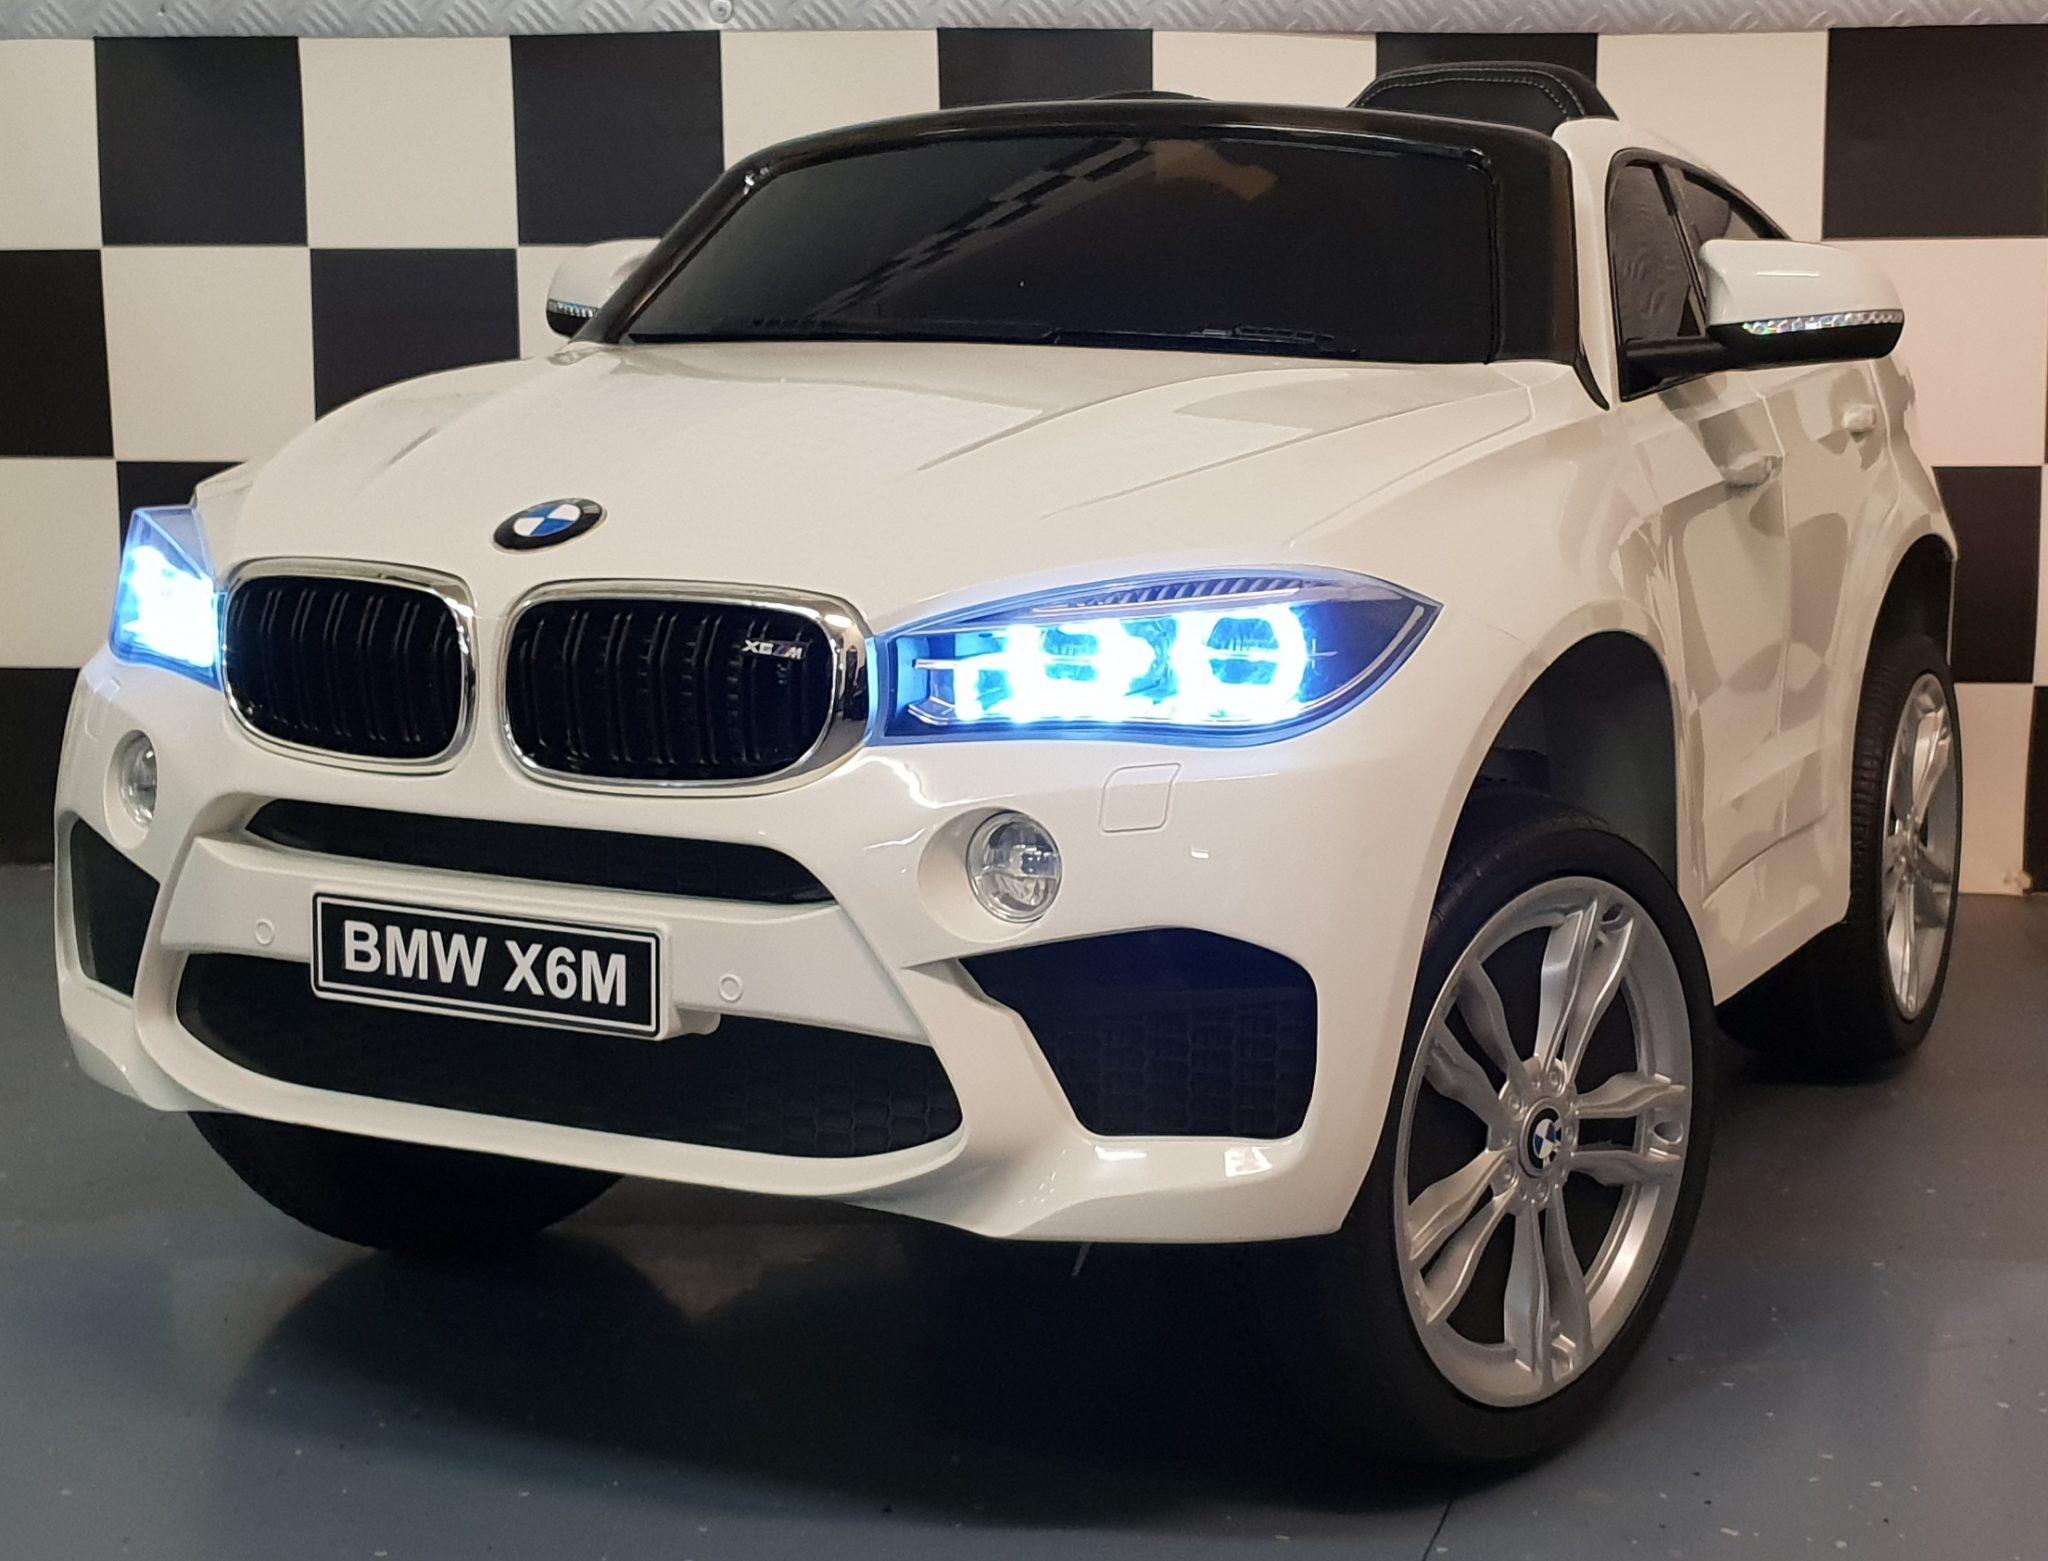 Kinderauto BMW X6 M Wit 12V 2.4G afstandbediening soft start